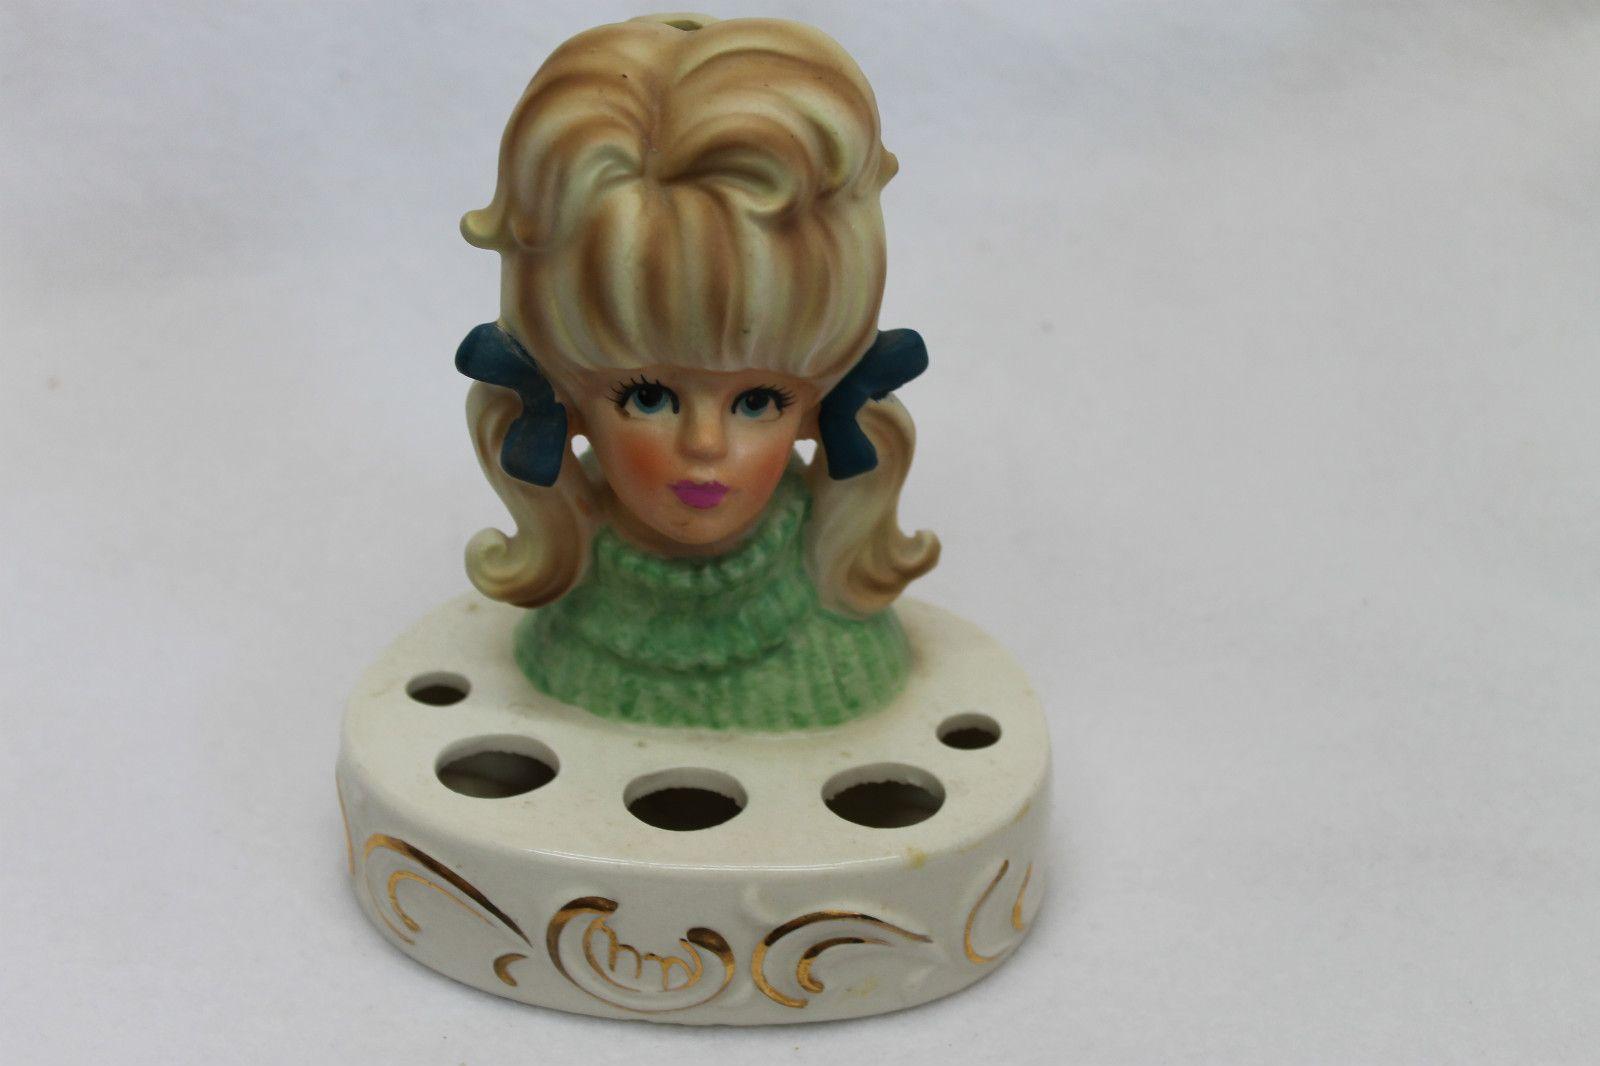 Young girl head vase lipstick holder headvase 3 pinterest vintage young girl head vase lipstick holder unmarked e reviewsmspy